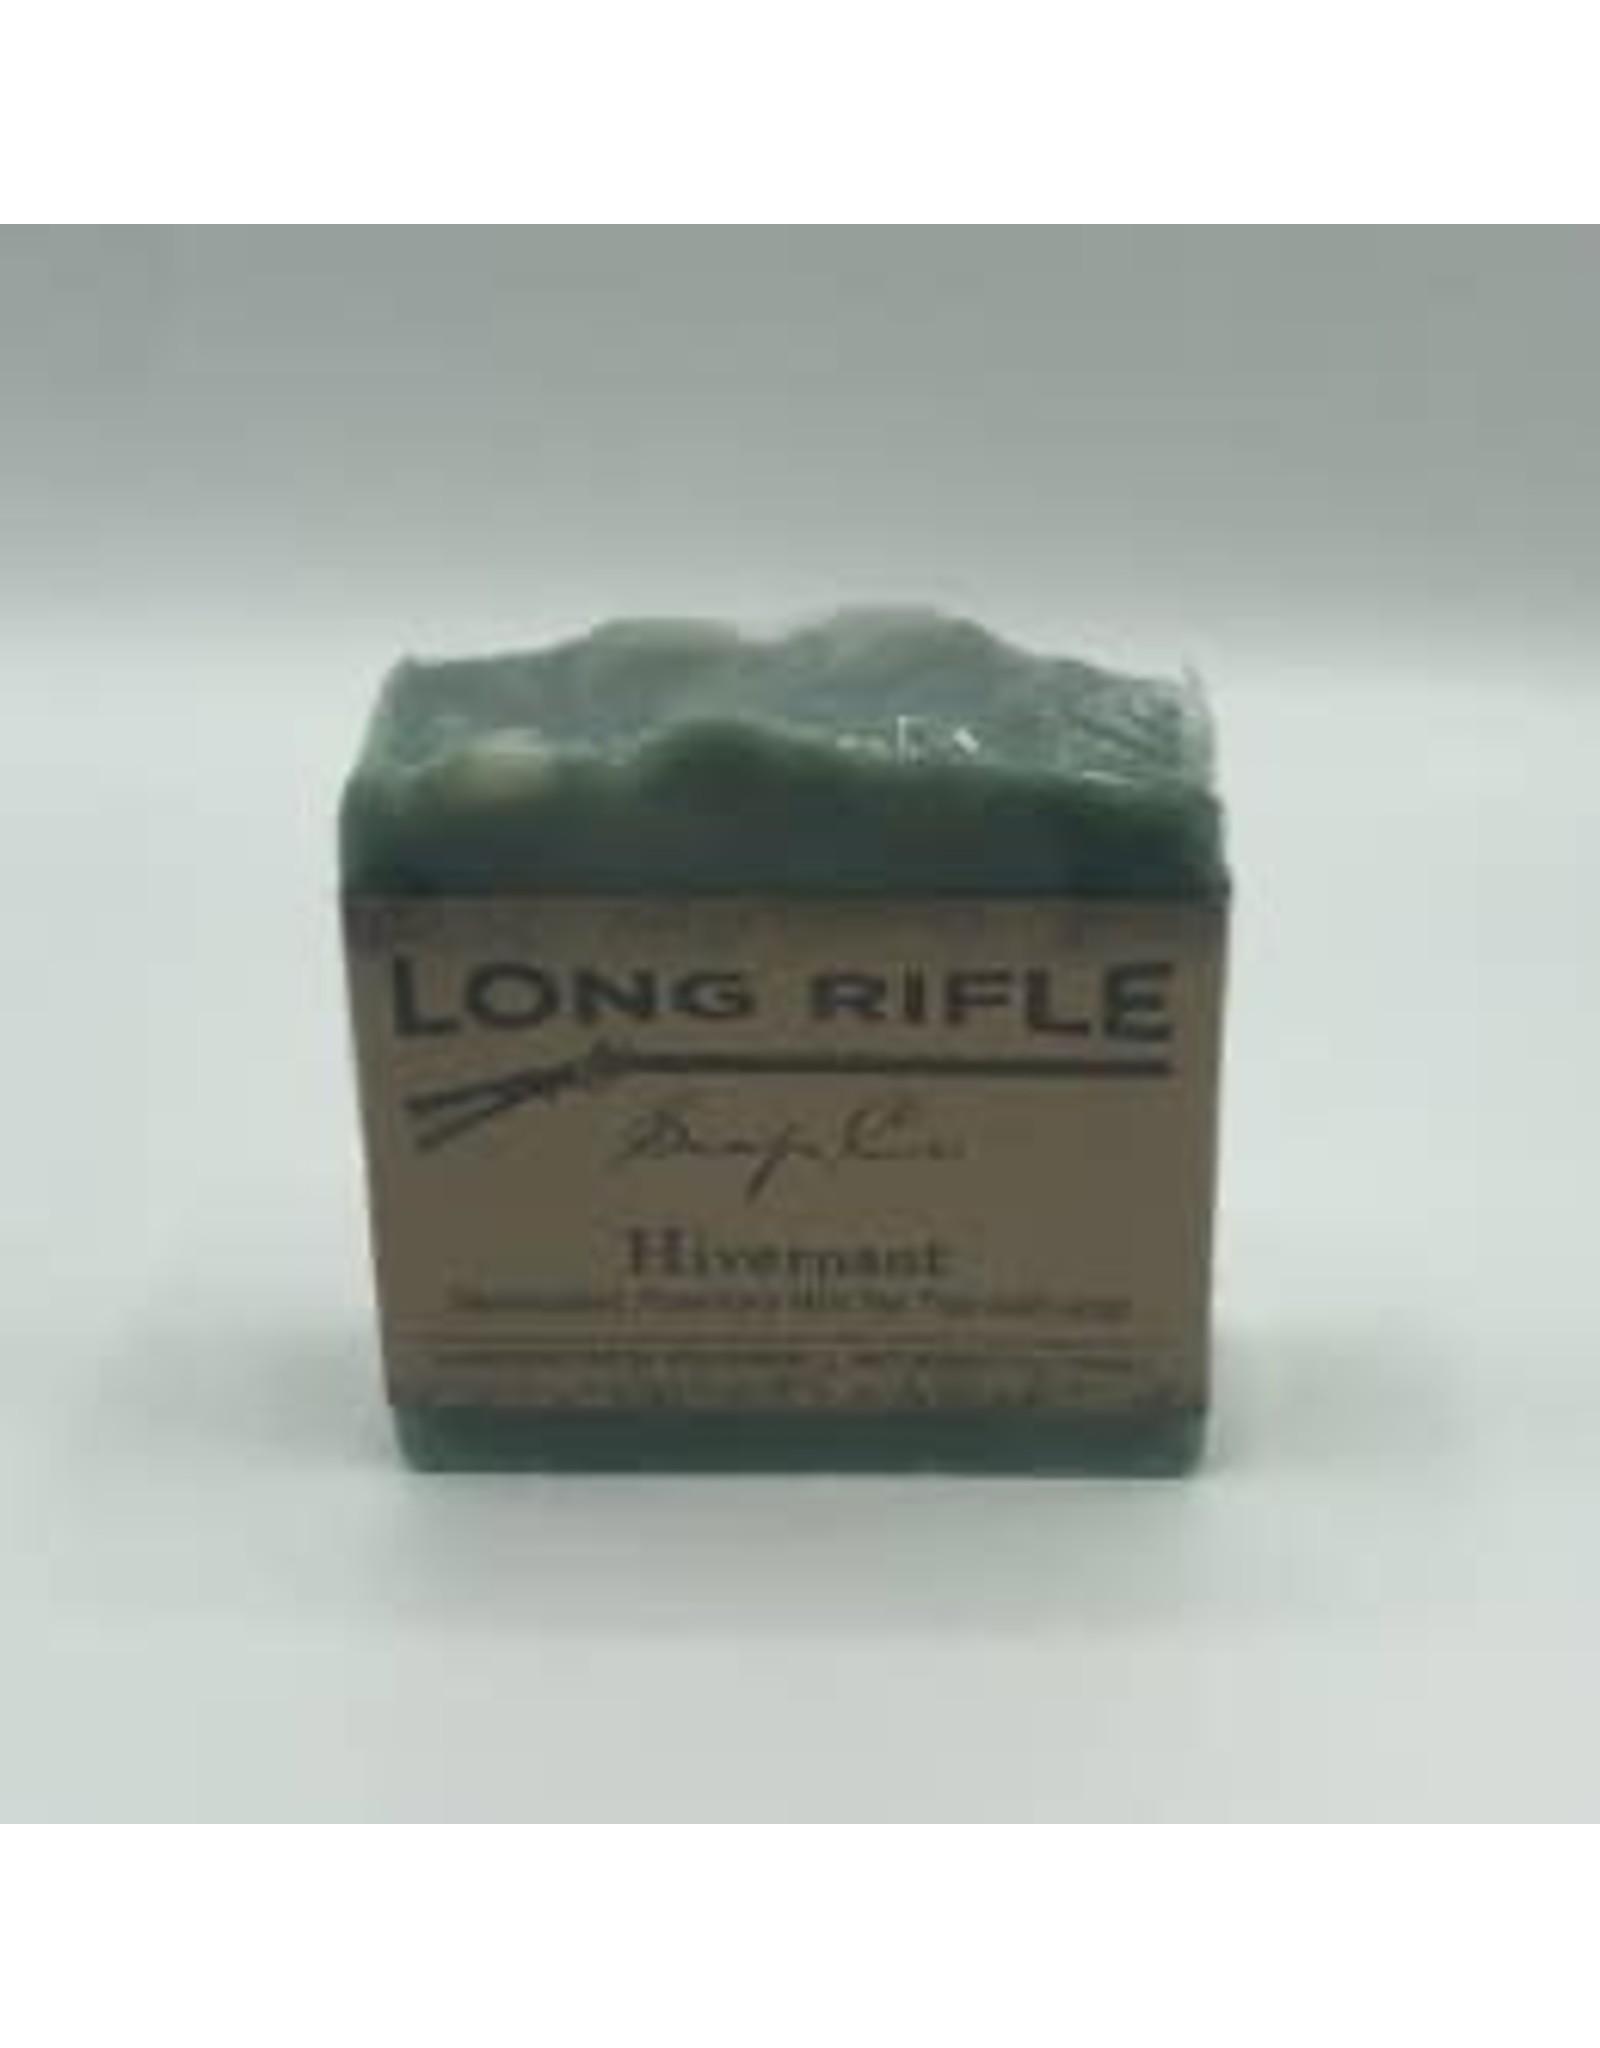 Long Rifle Men's Bar Soap - Hivernant